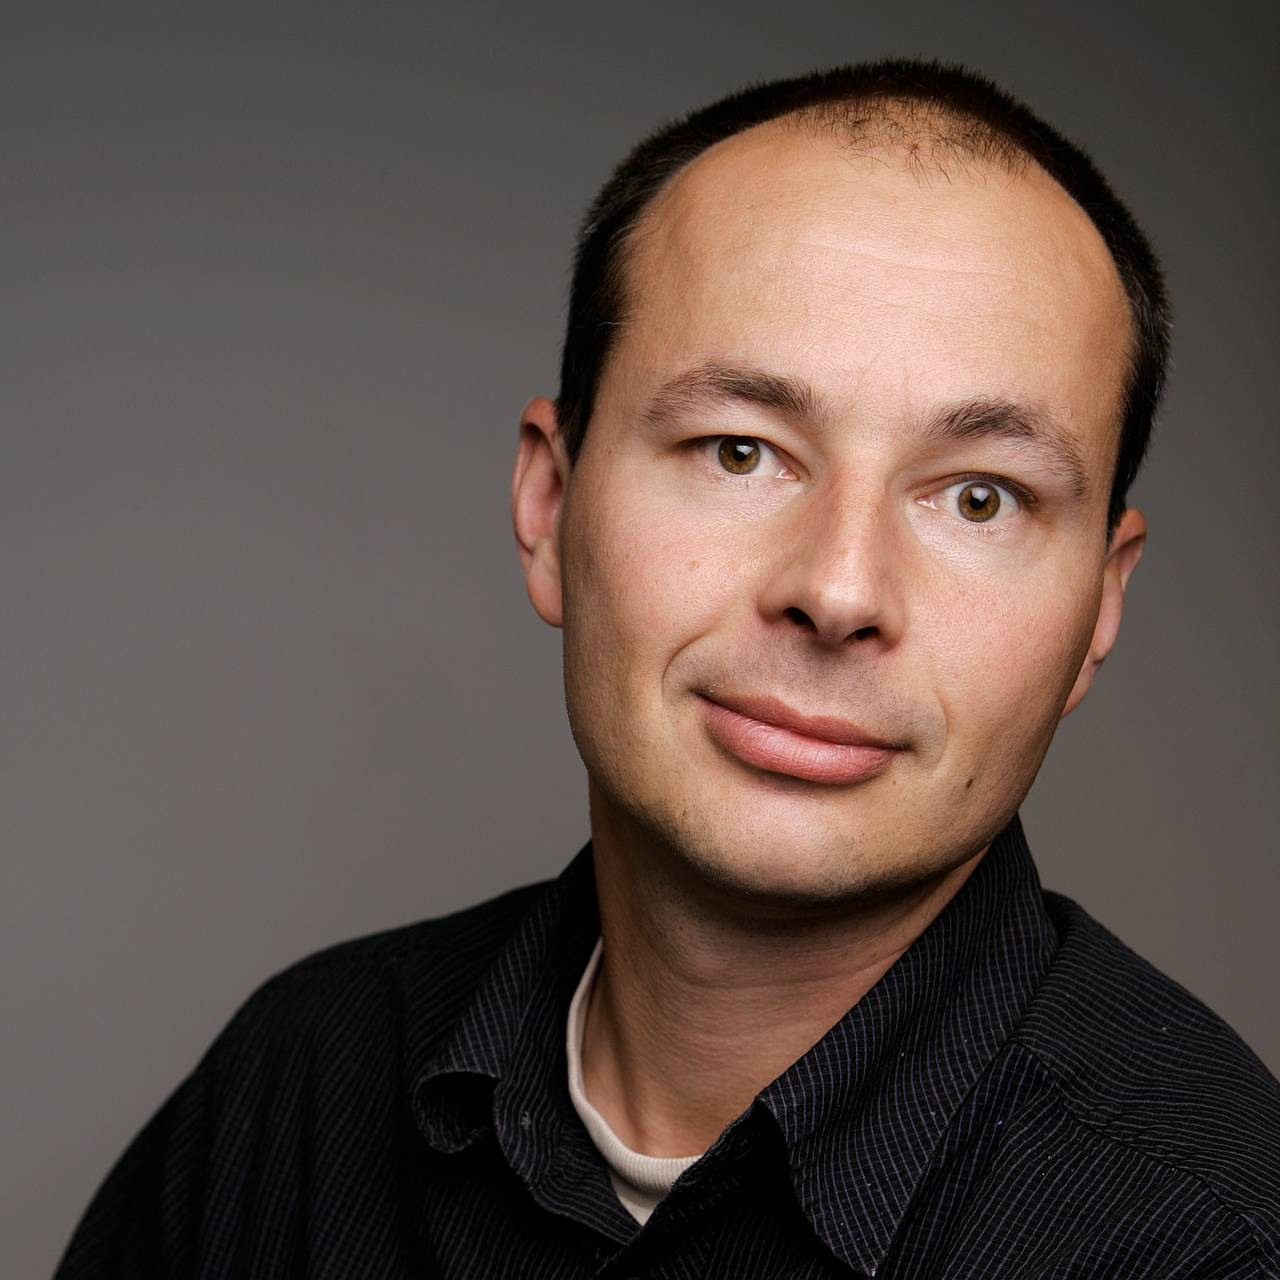 Rasmus Benestad